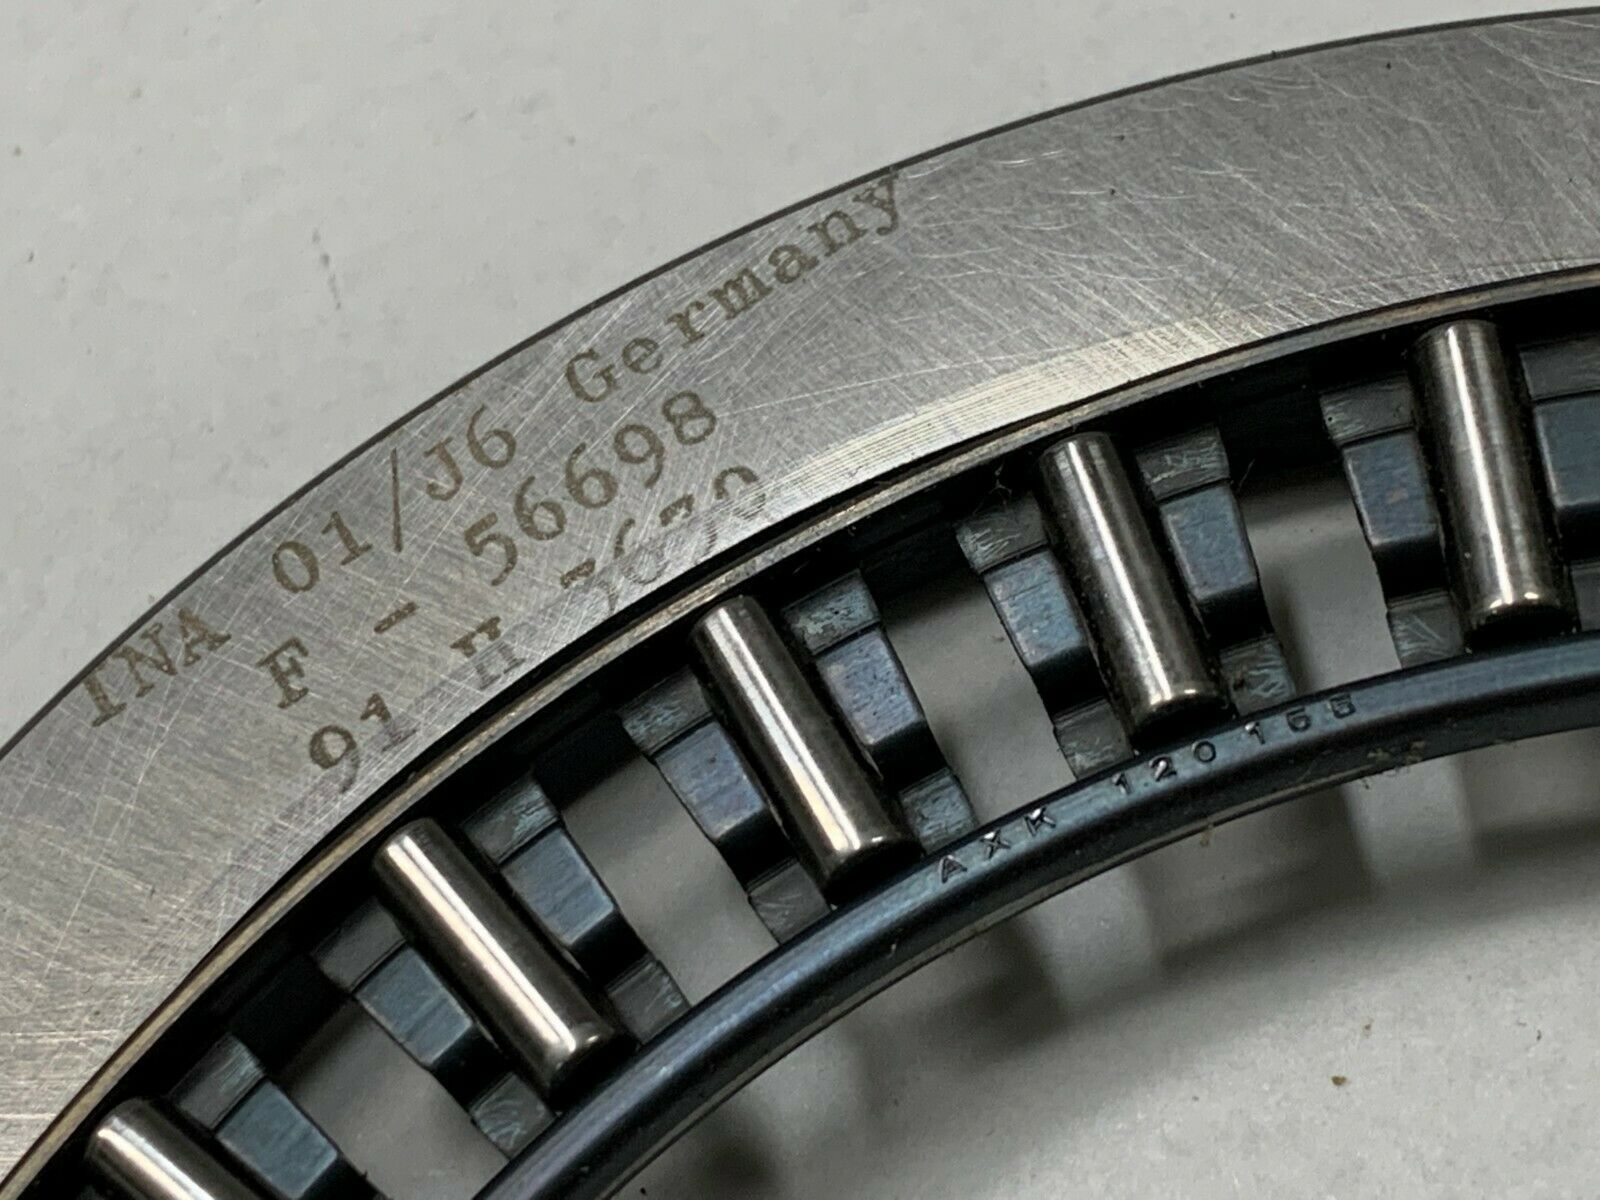 1 PCS AXK75100 Thrust Needle Roller Bearing w//Washers 75*100*4 75x100x4 mm